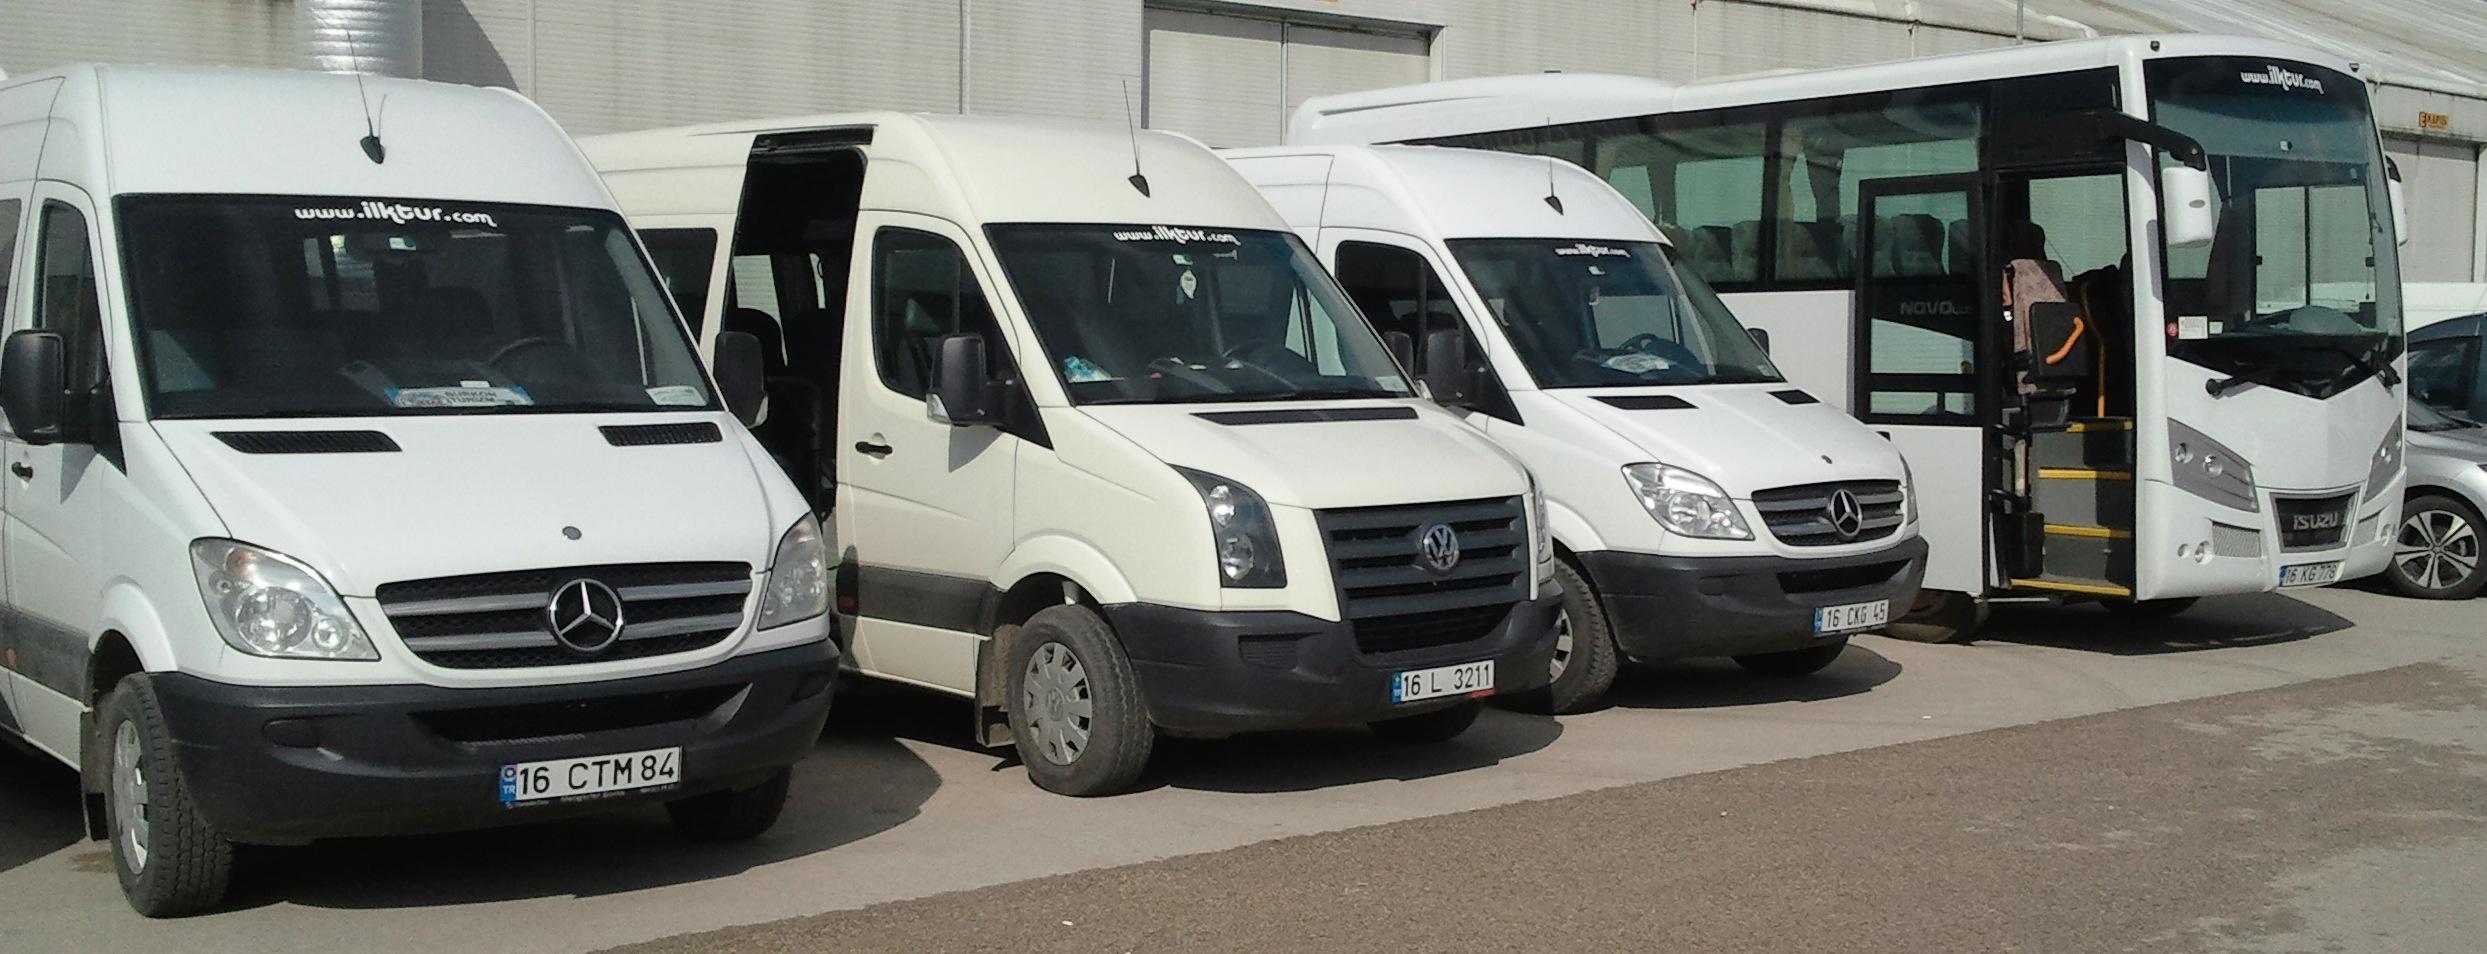 bursa midibus minibus kiralama